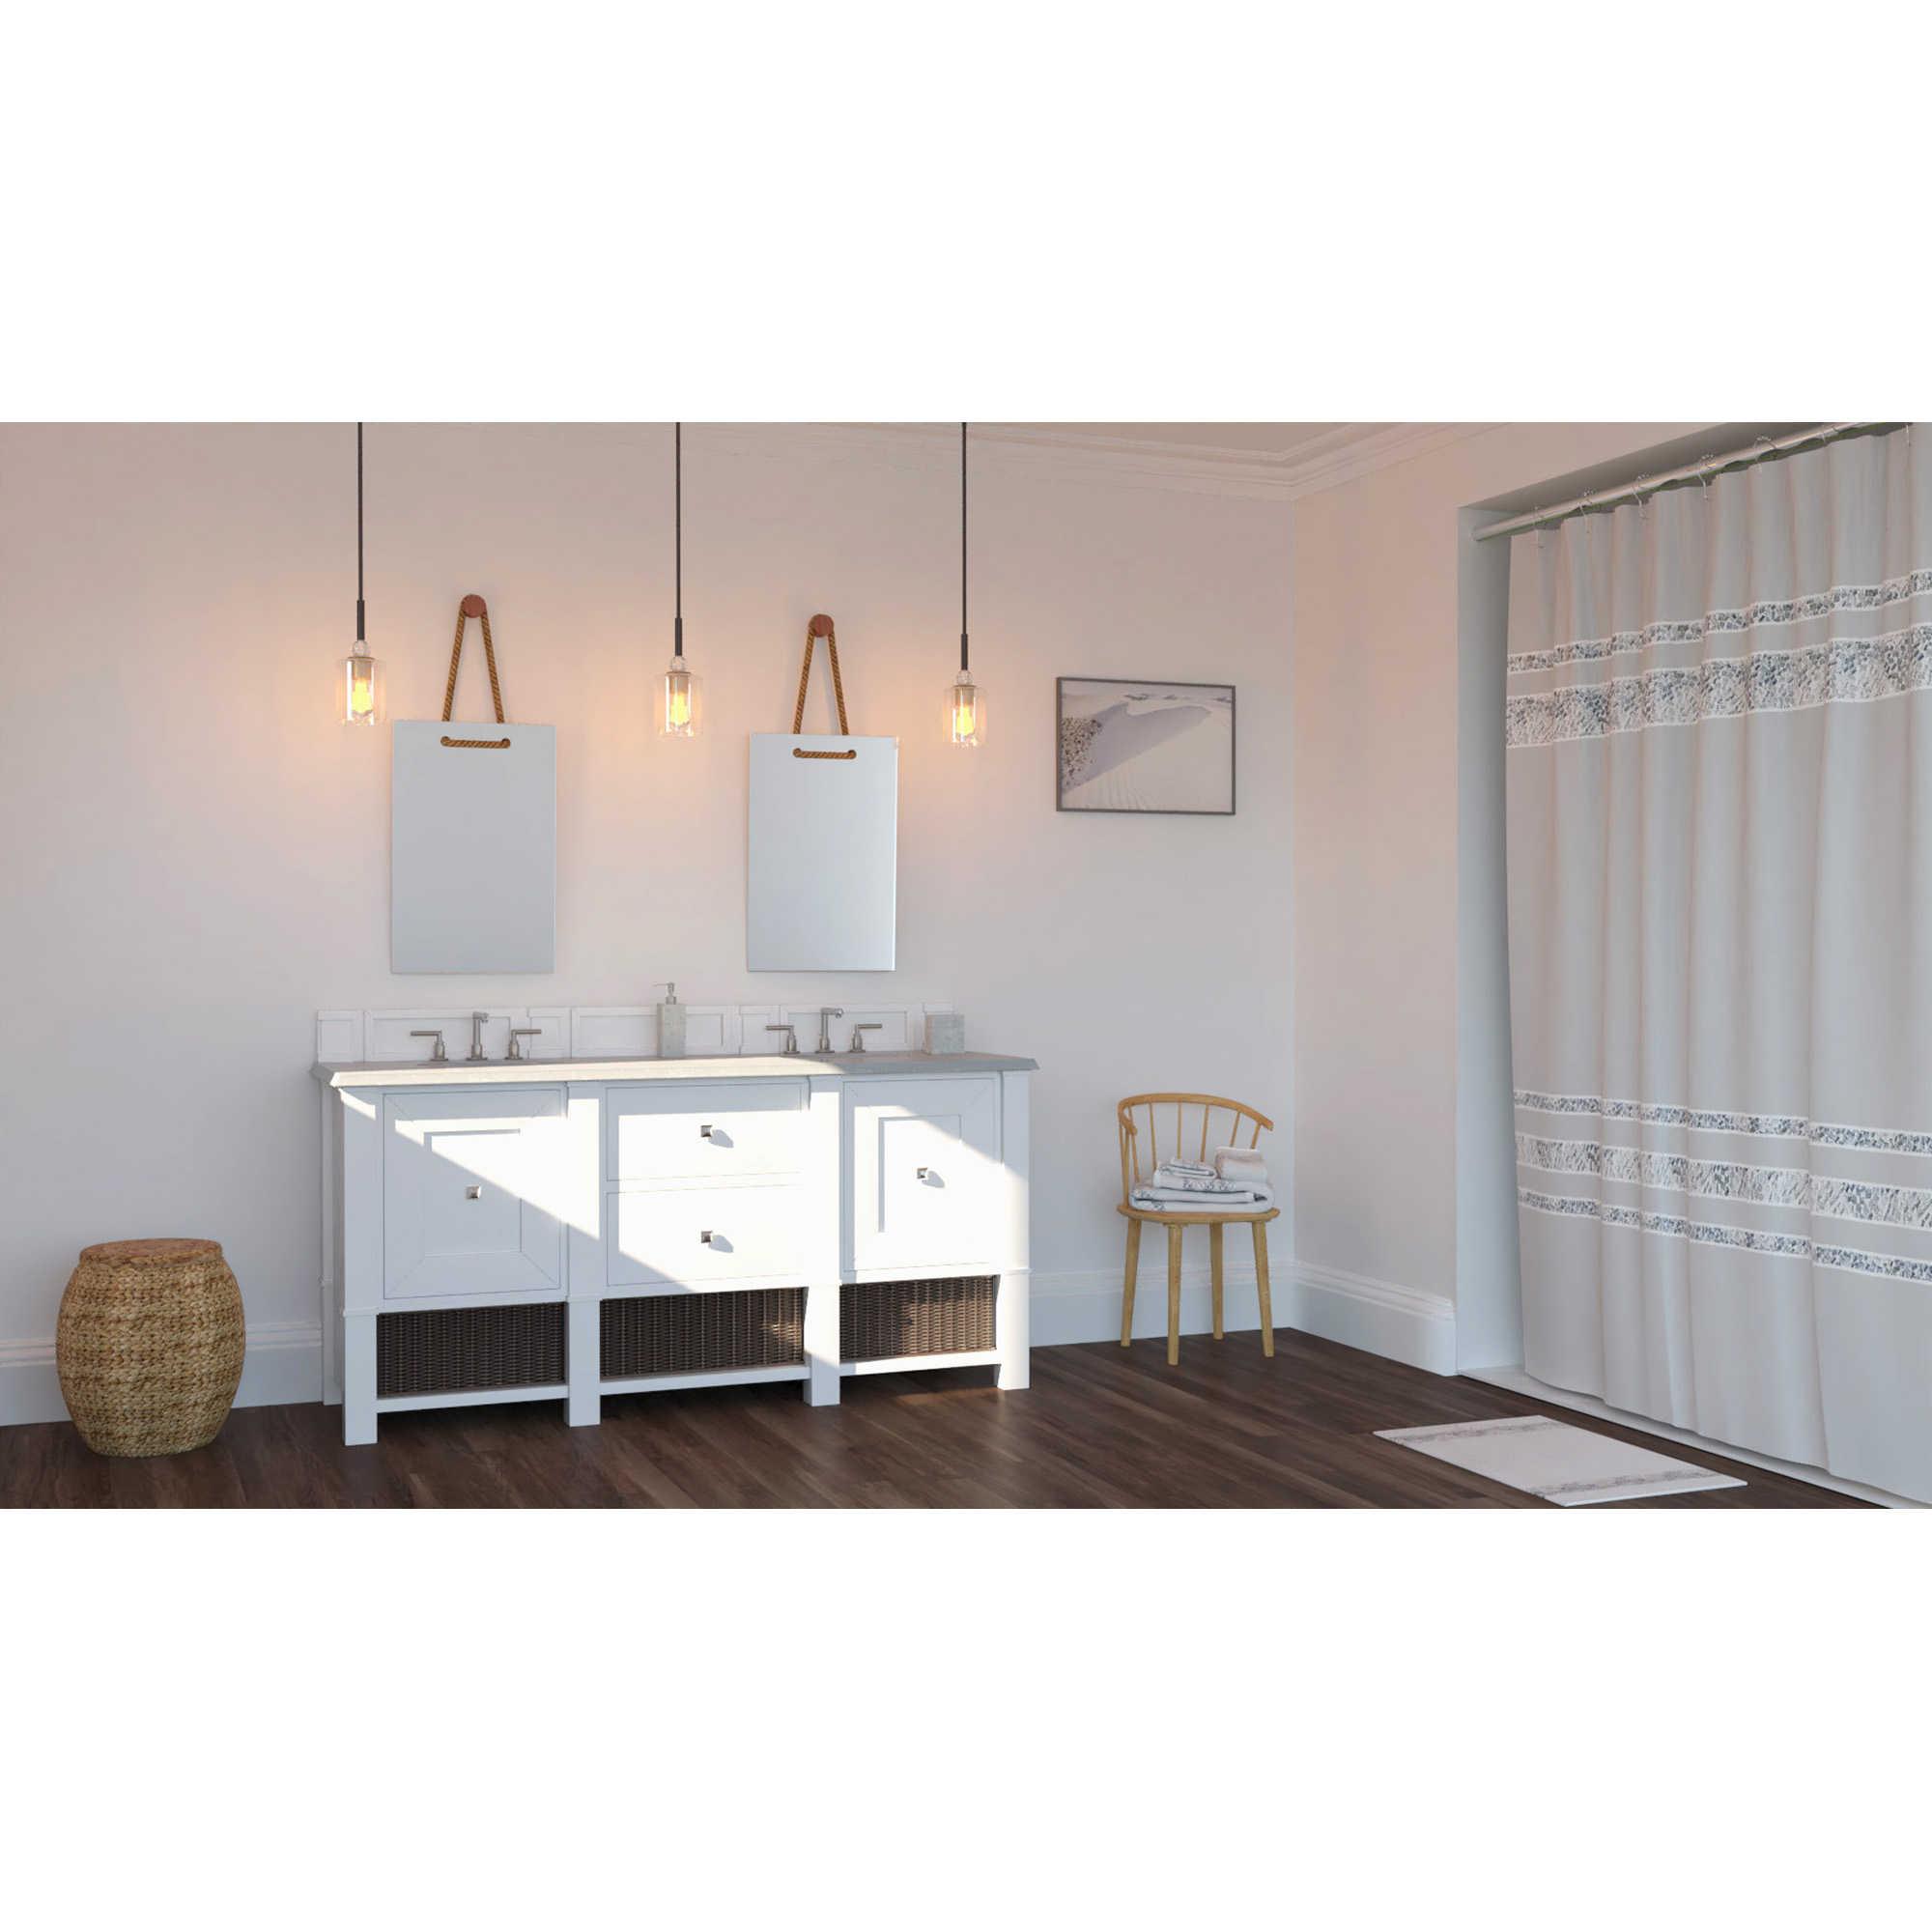 Oceanside Escape Bathroom Collection - Bed Bath & Beyond